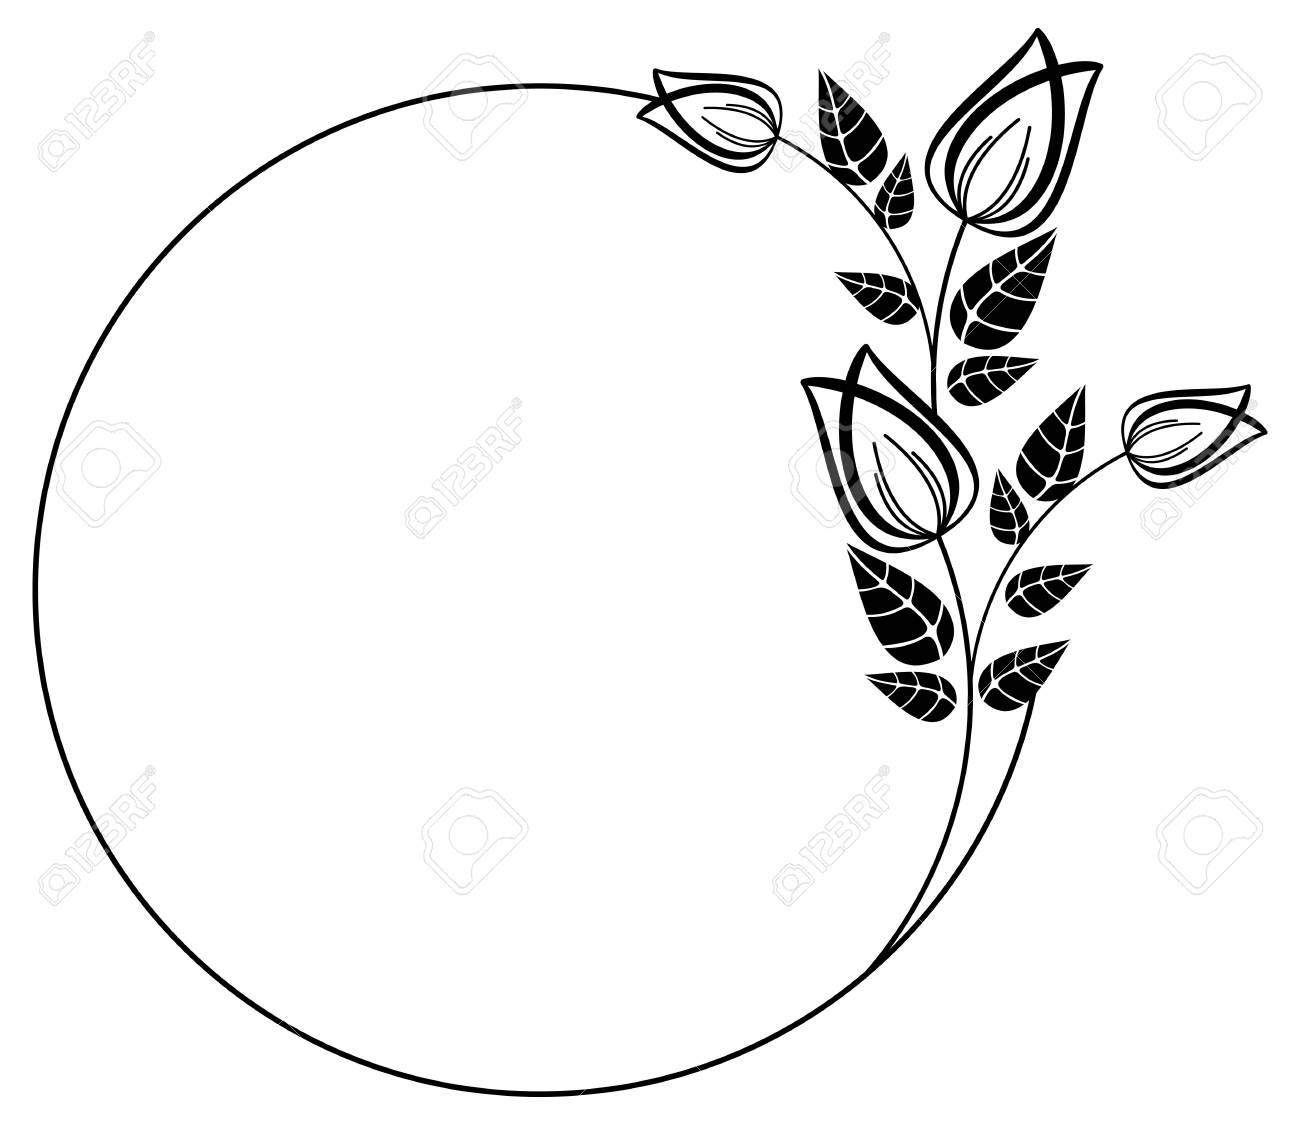 round black and white frame outline decorative flowers copy rh 123rf com Decorative Spring Clip Art Decorative Borders Clip Art